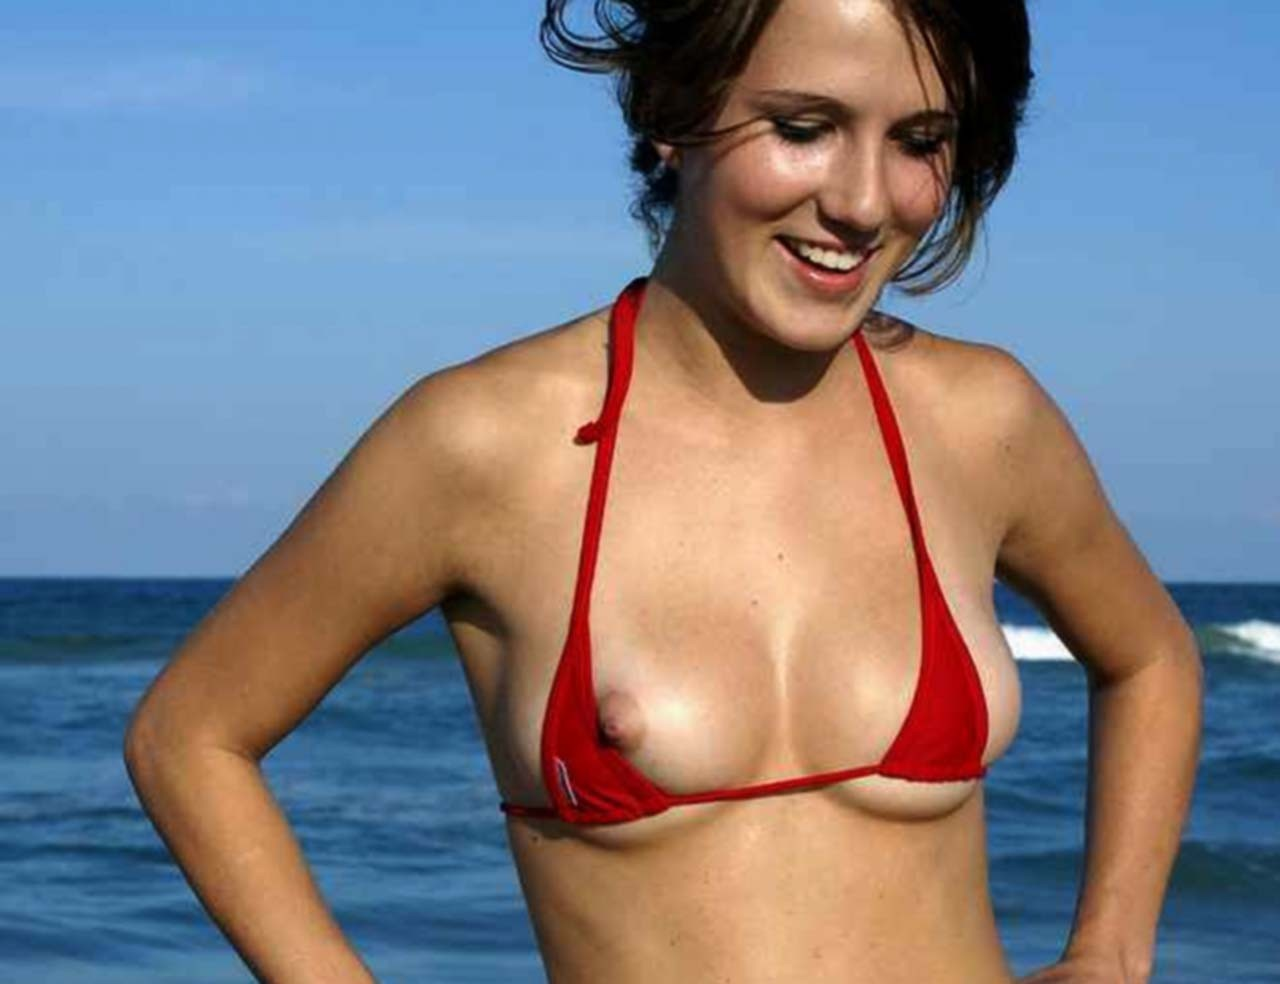 моются на пляже у девушки видно грудь тетки эротично